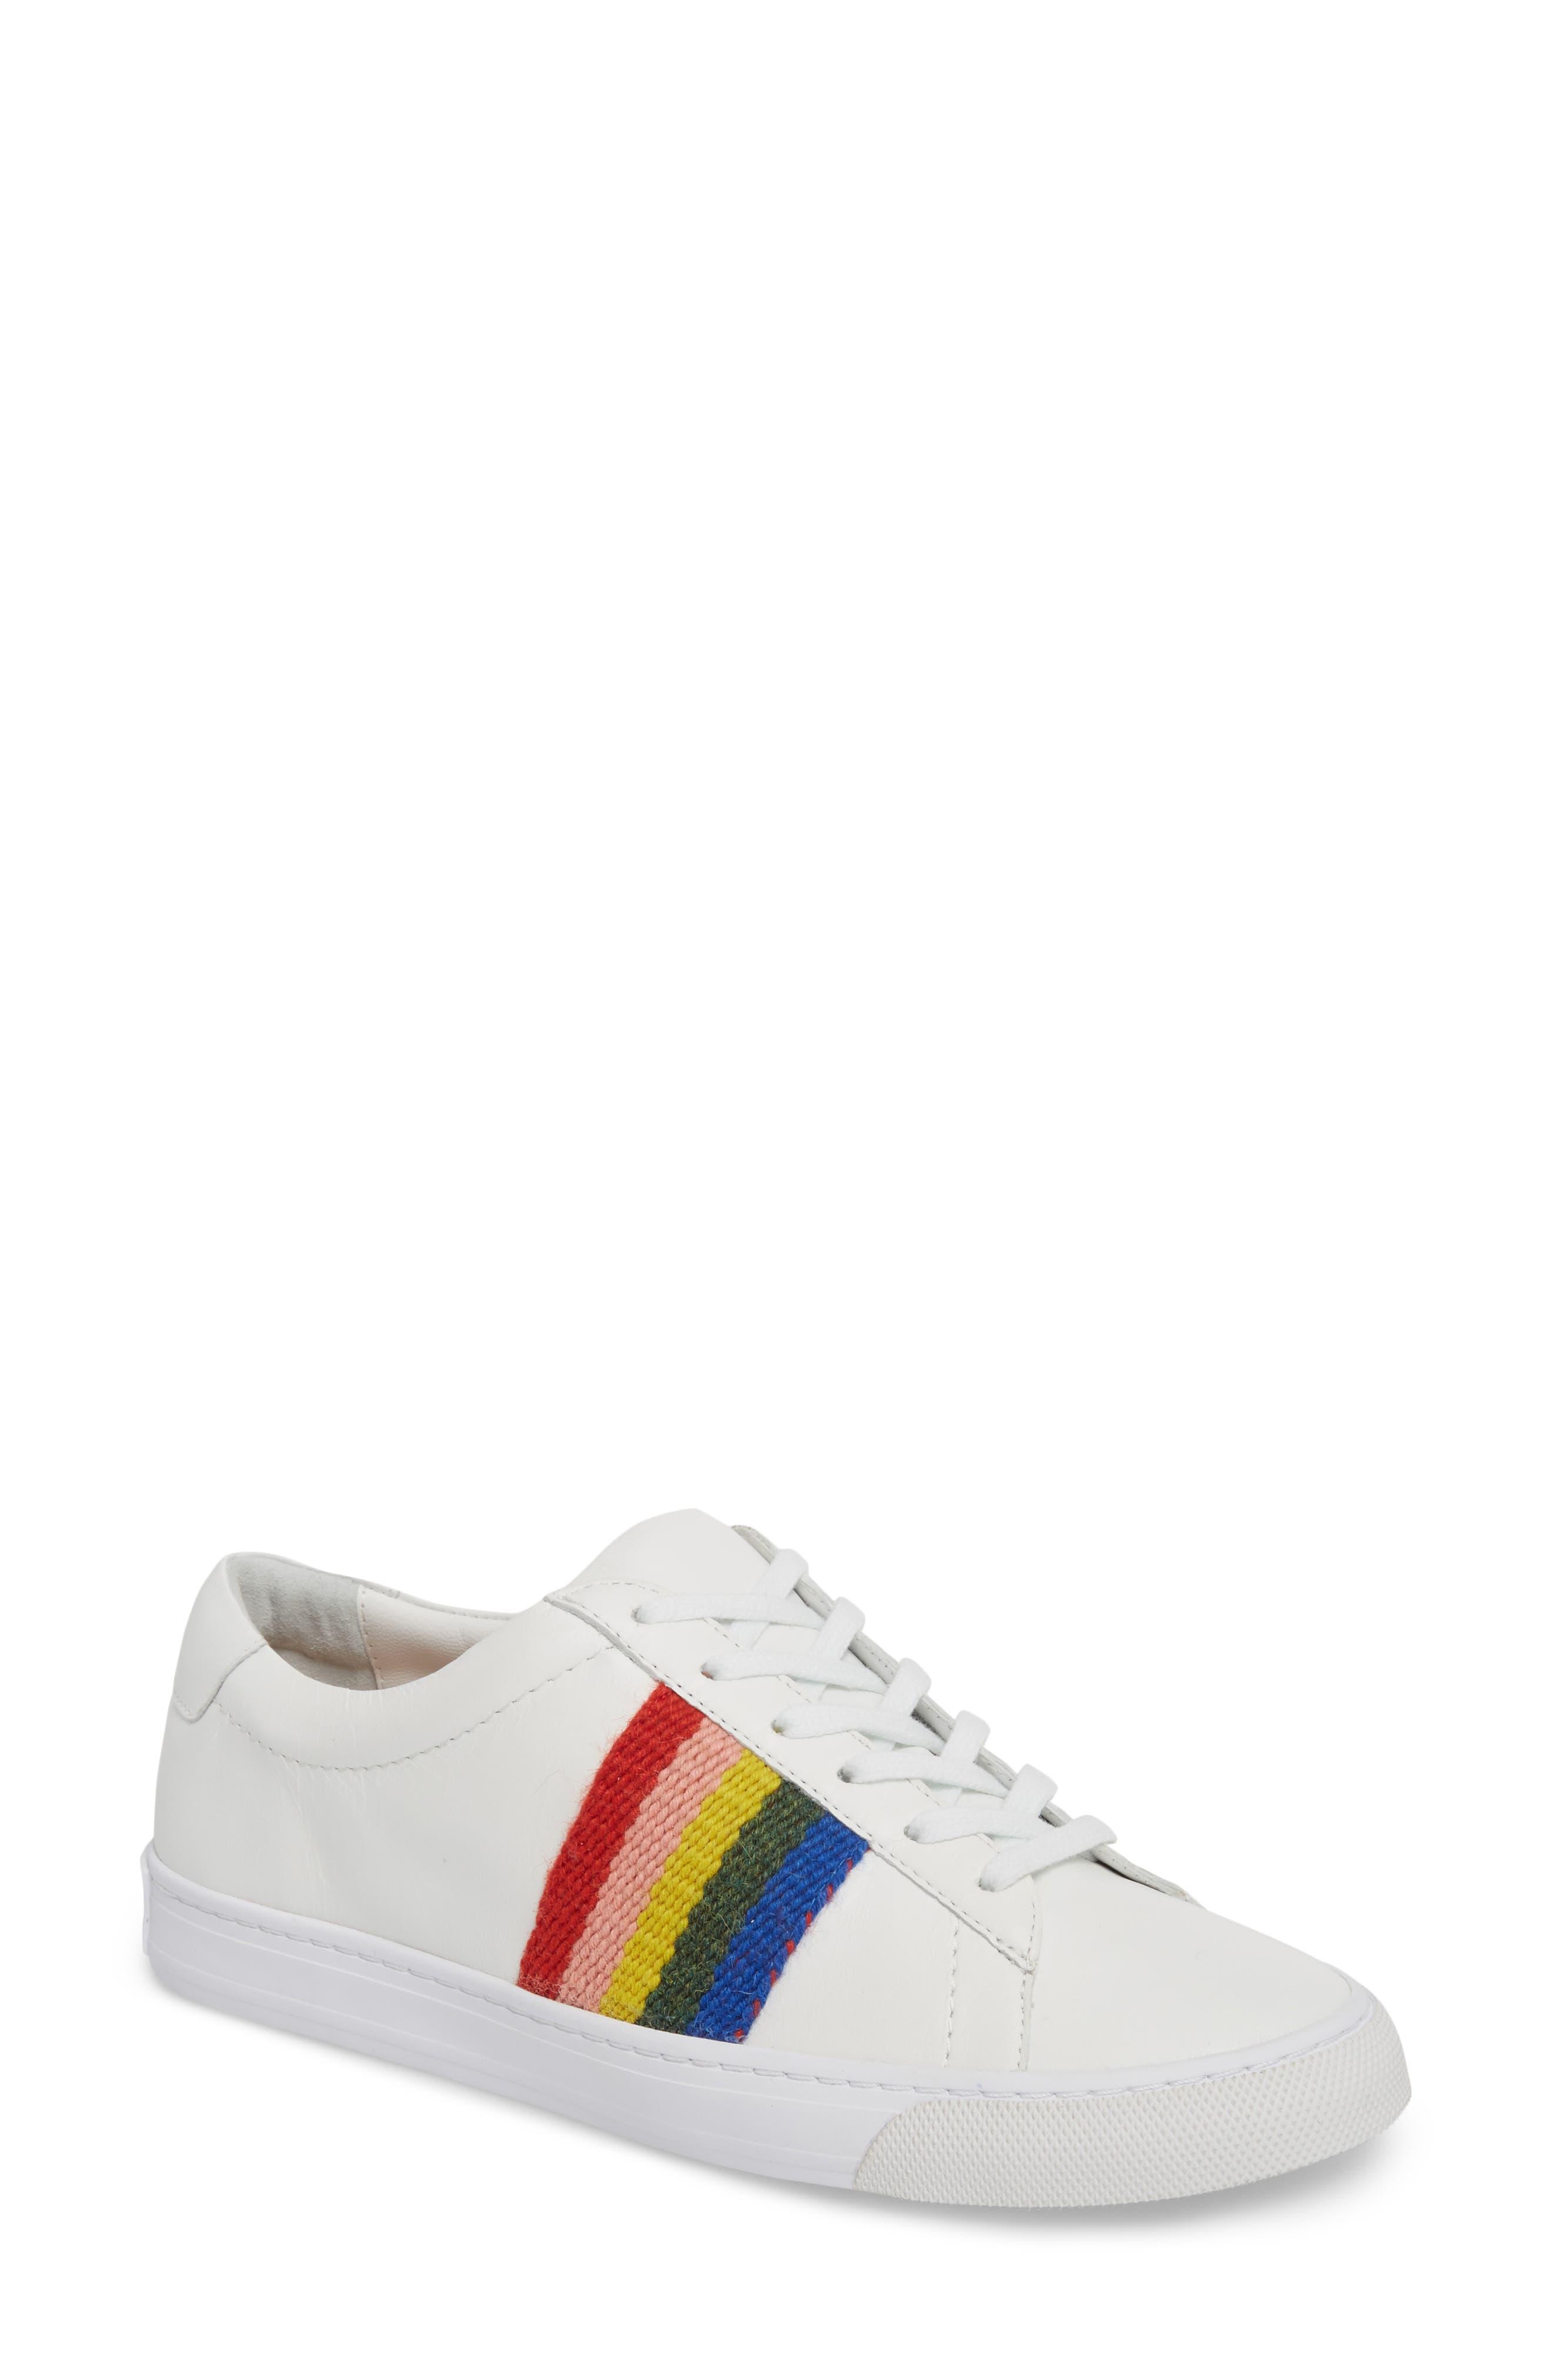 Logan Rainbow Sneaker,                         Main,                         color, WHITE/ RAINBOW